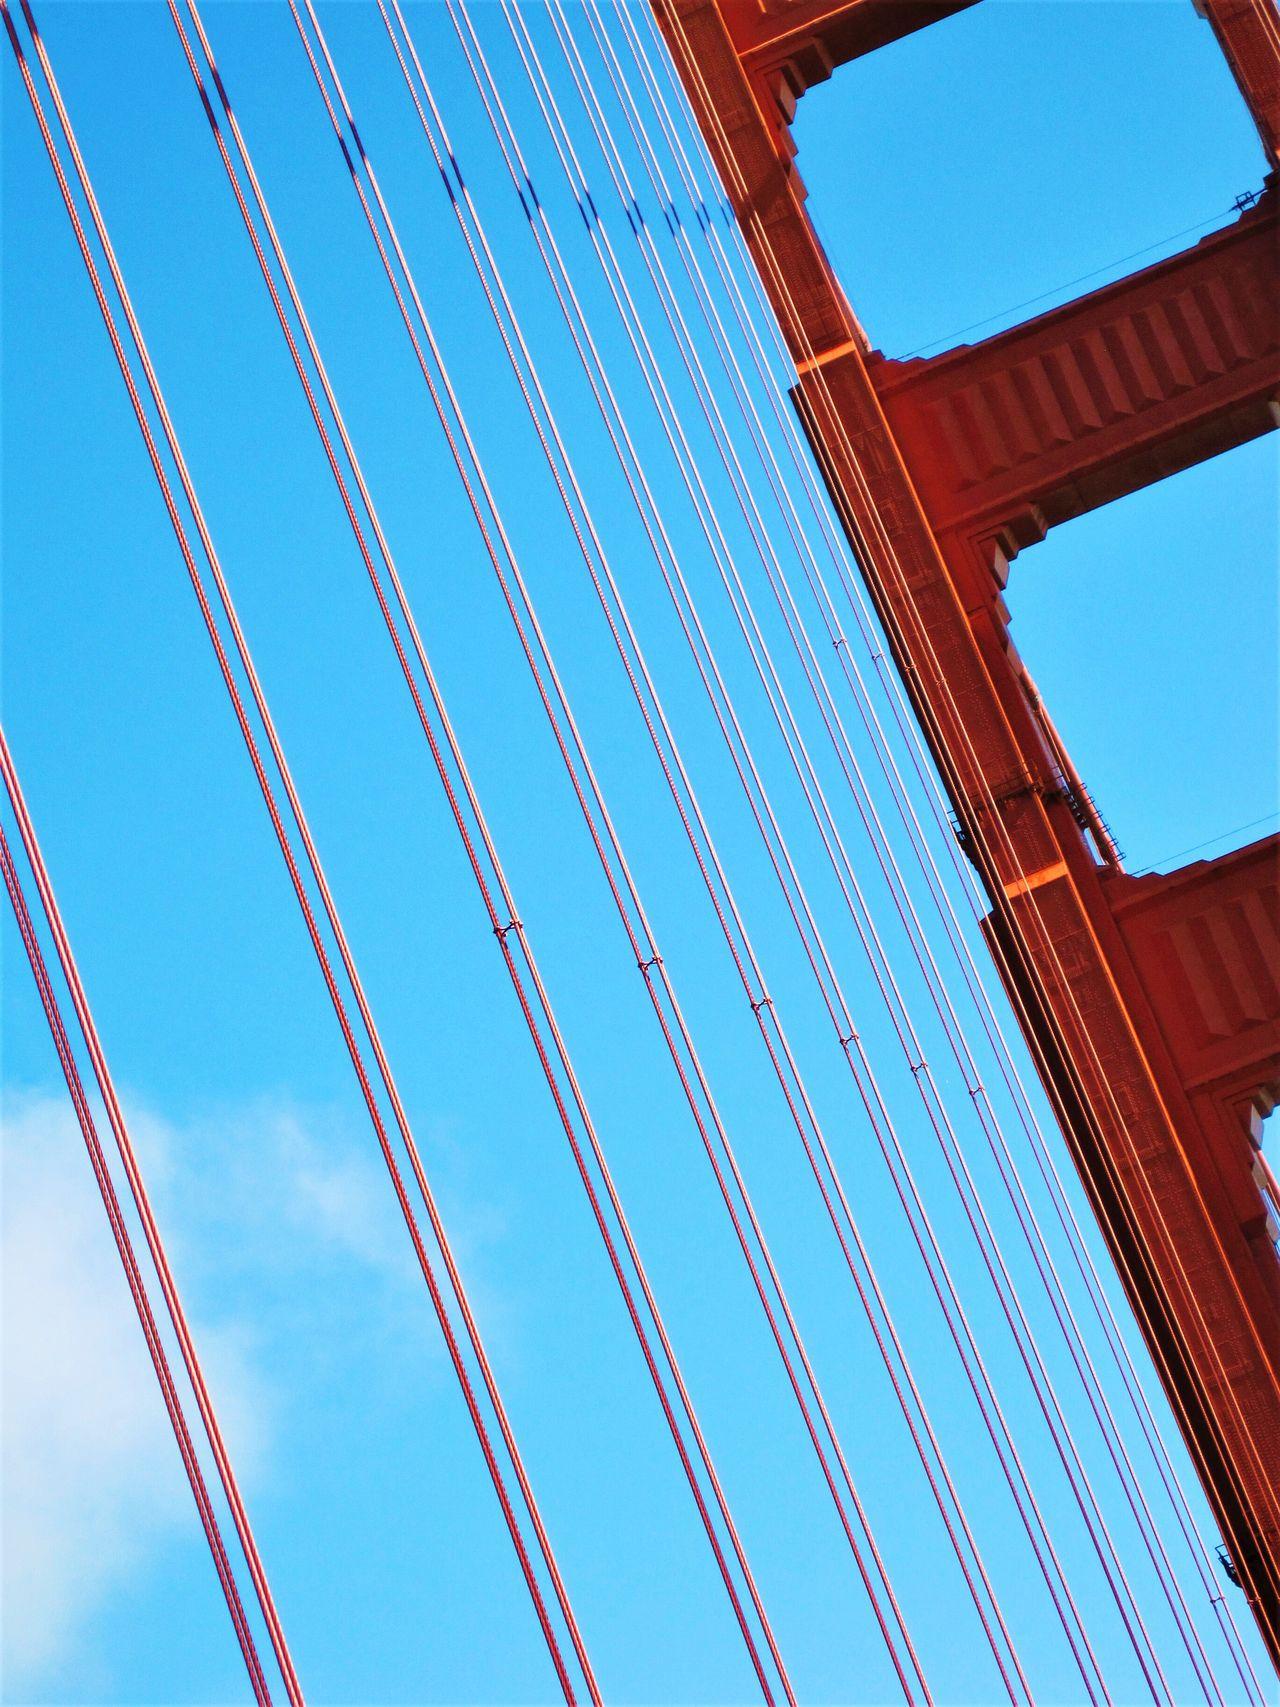 Architecture Built Structure Low Angle View Sky Outdoors Suspension Bridge Bridge - Man Made Structure Bridge Golden Gate Bridge San Francisco Outside Connection EyeEmNewHere EyeEm EyeEm Gallery EyeEm Best Shots EyeEm Best Shots - Architecture EyeEmBestPics